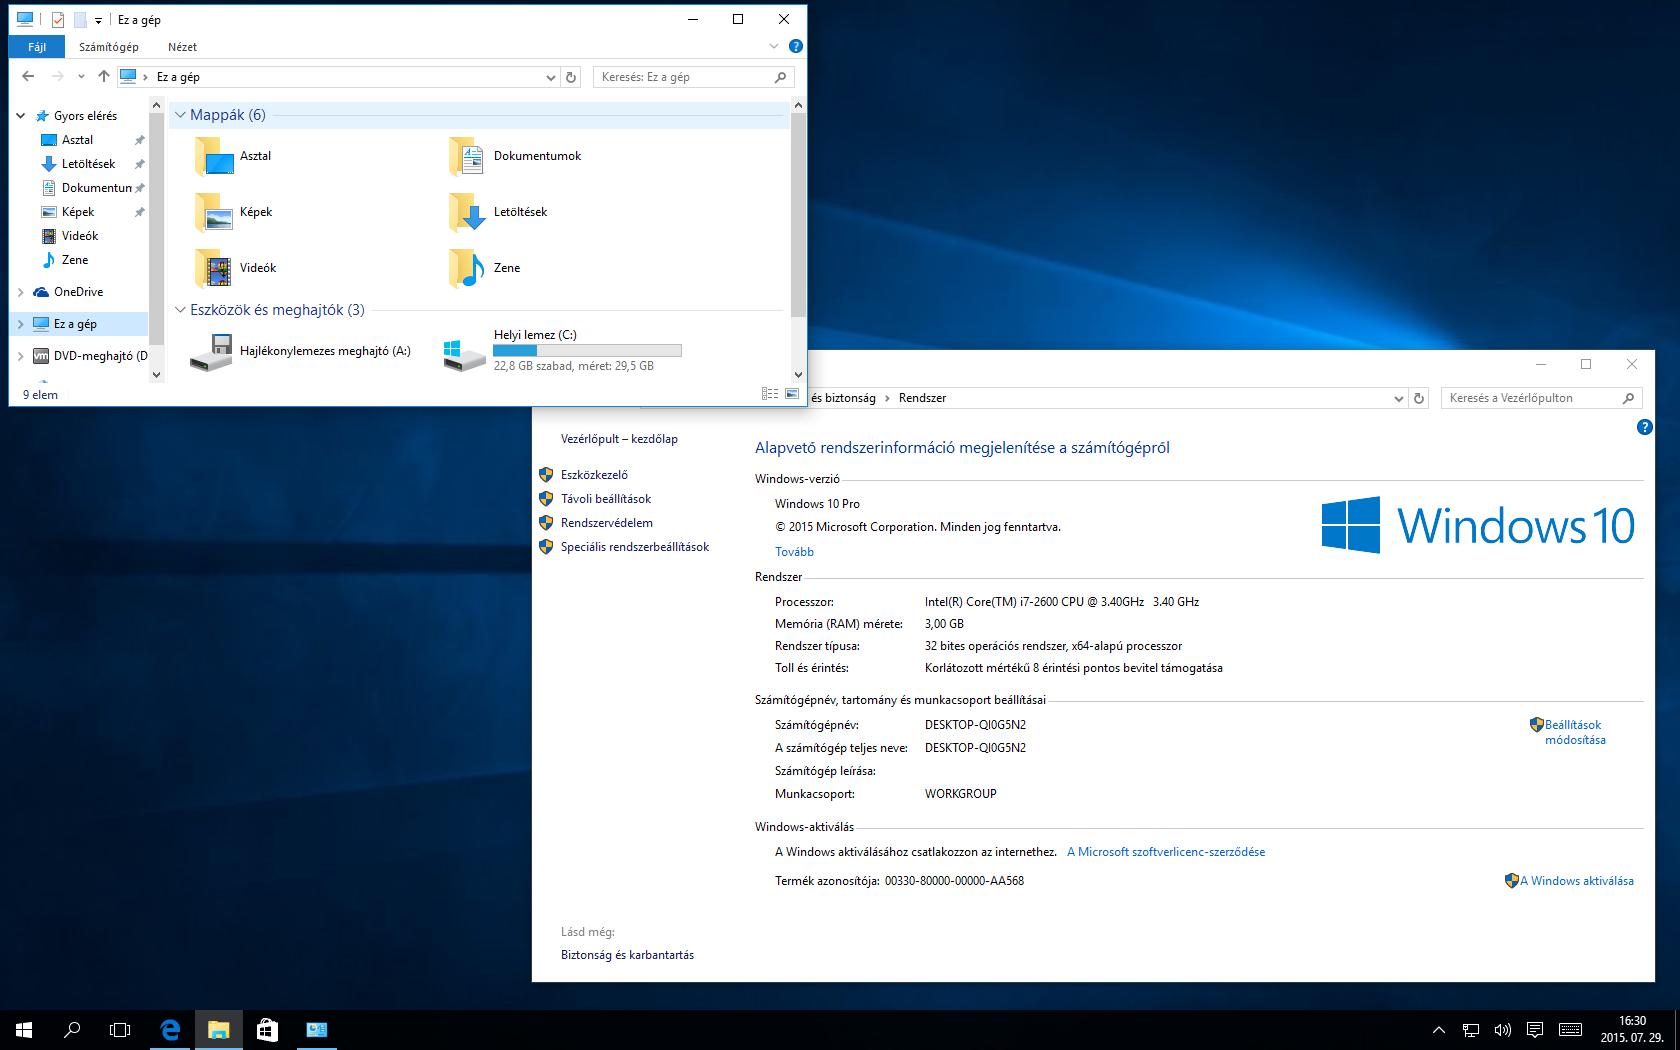 Windows 10 rendszerinfo